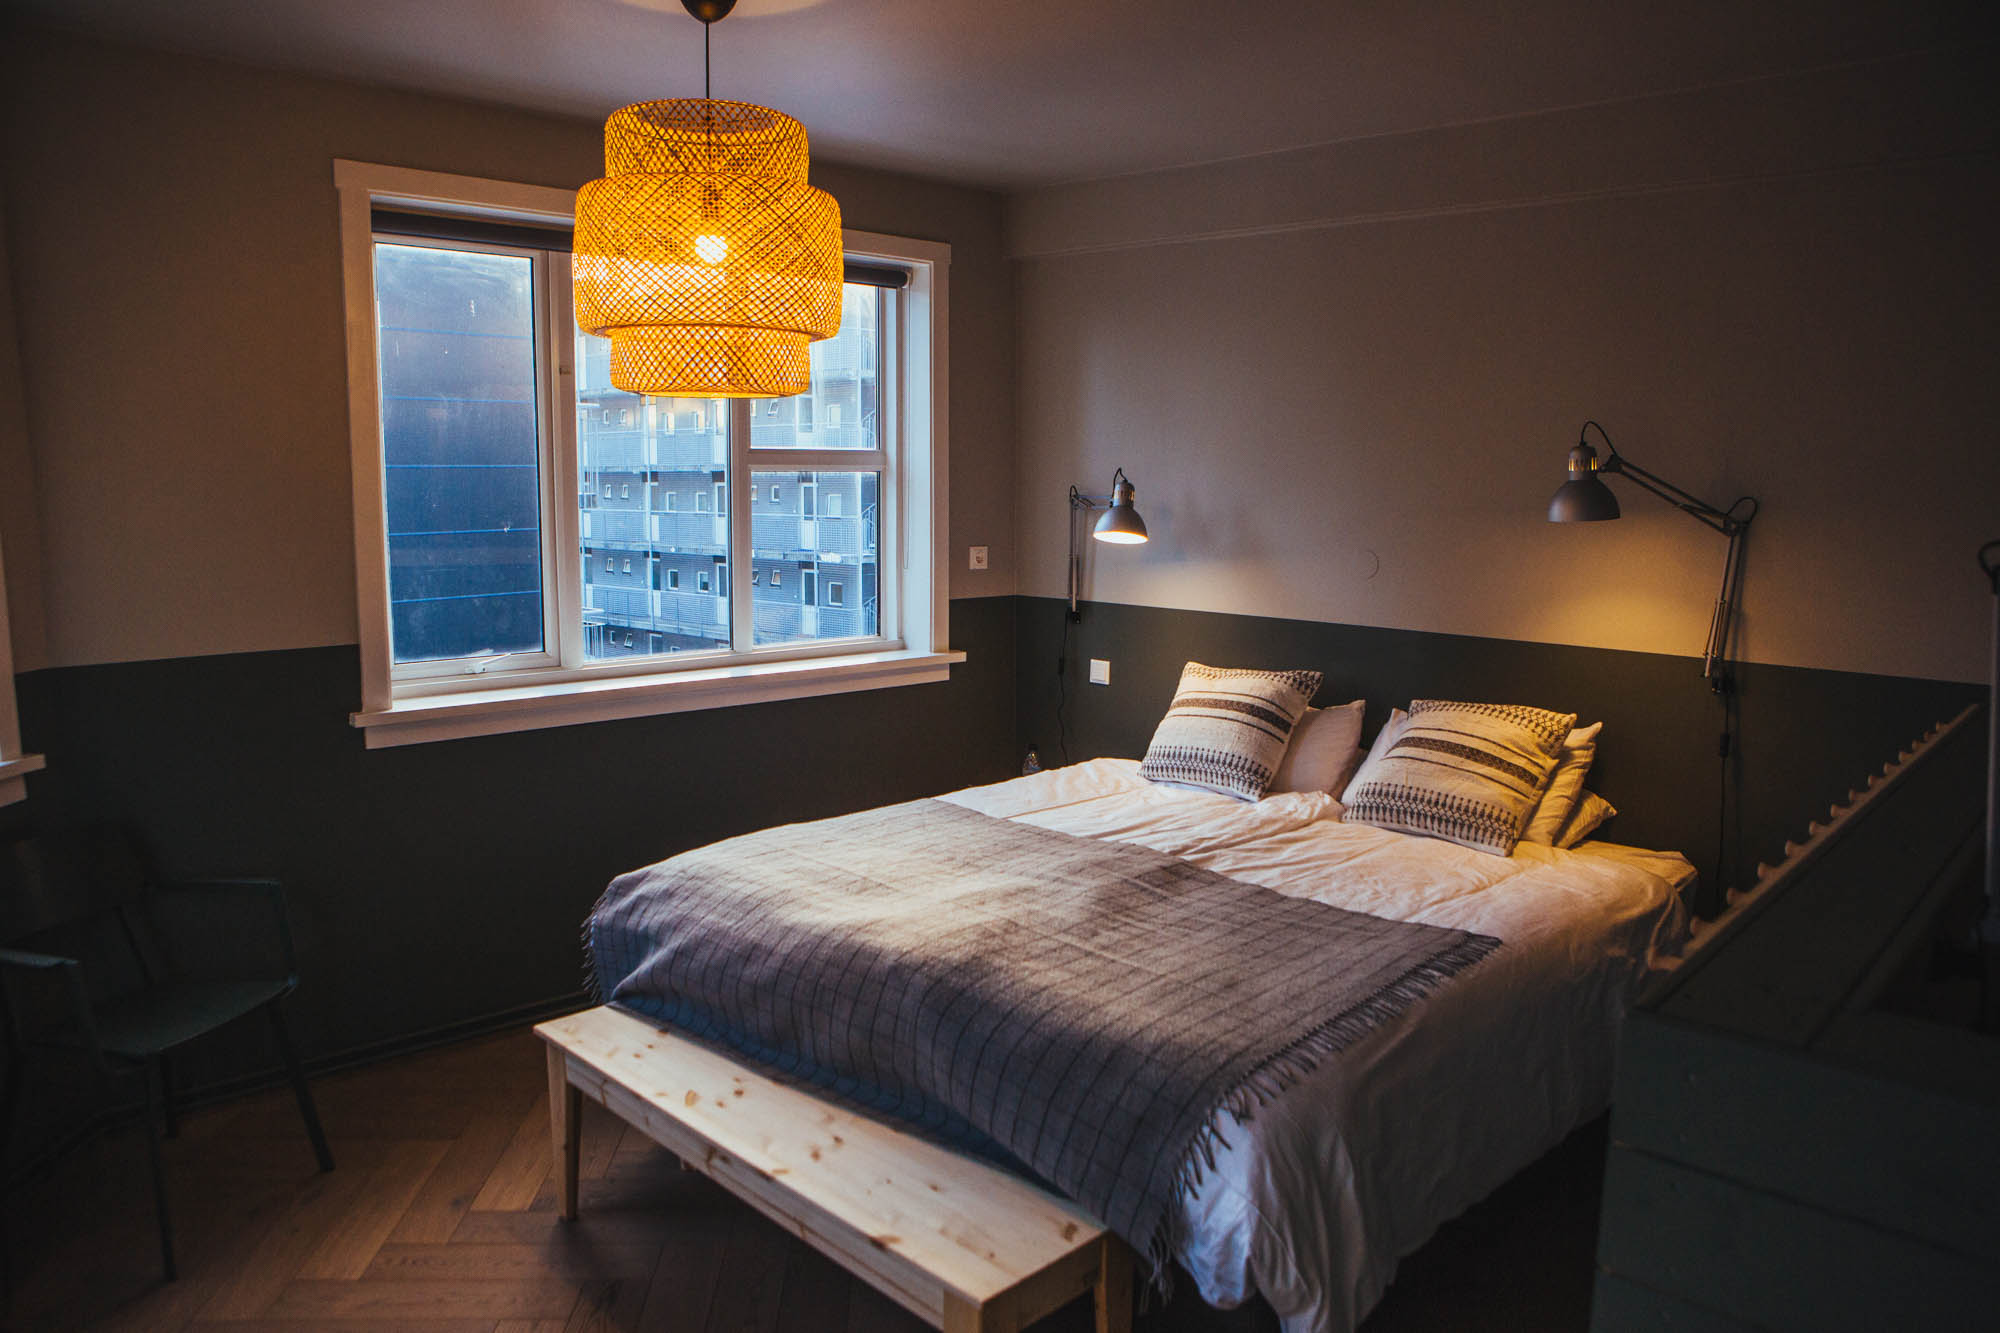 Iceland photo inspiration – The Swan House, Reykjavik